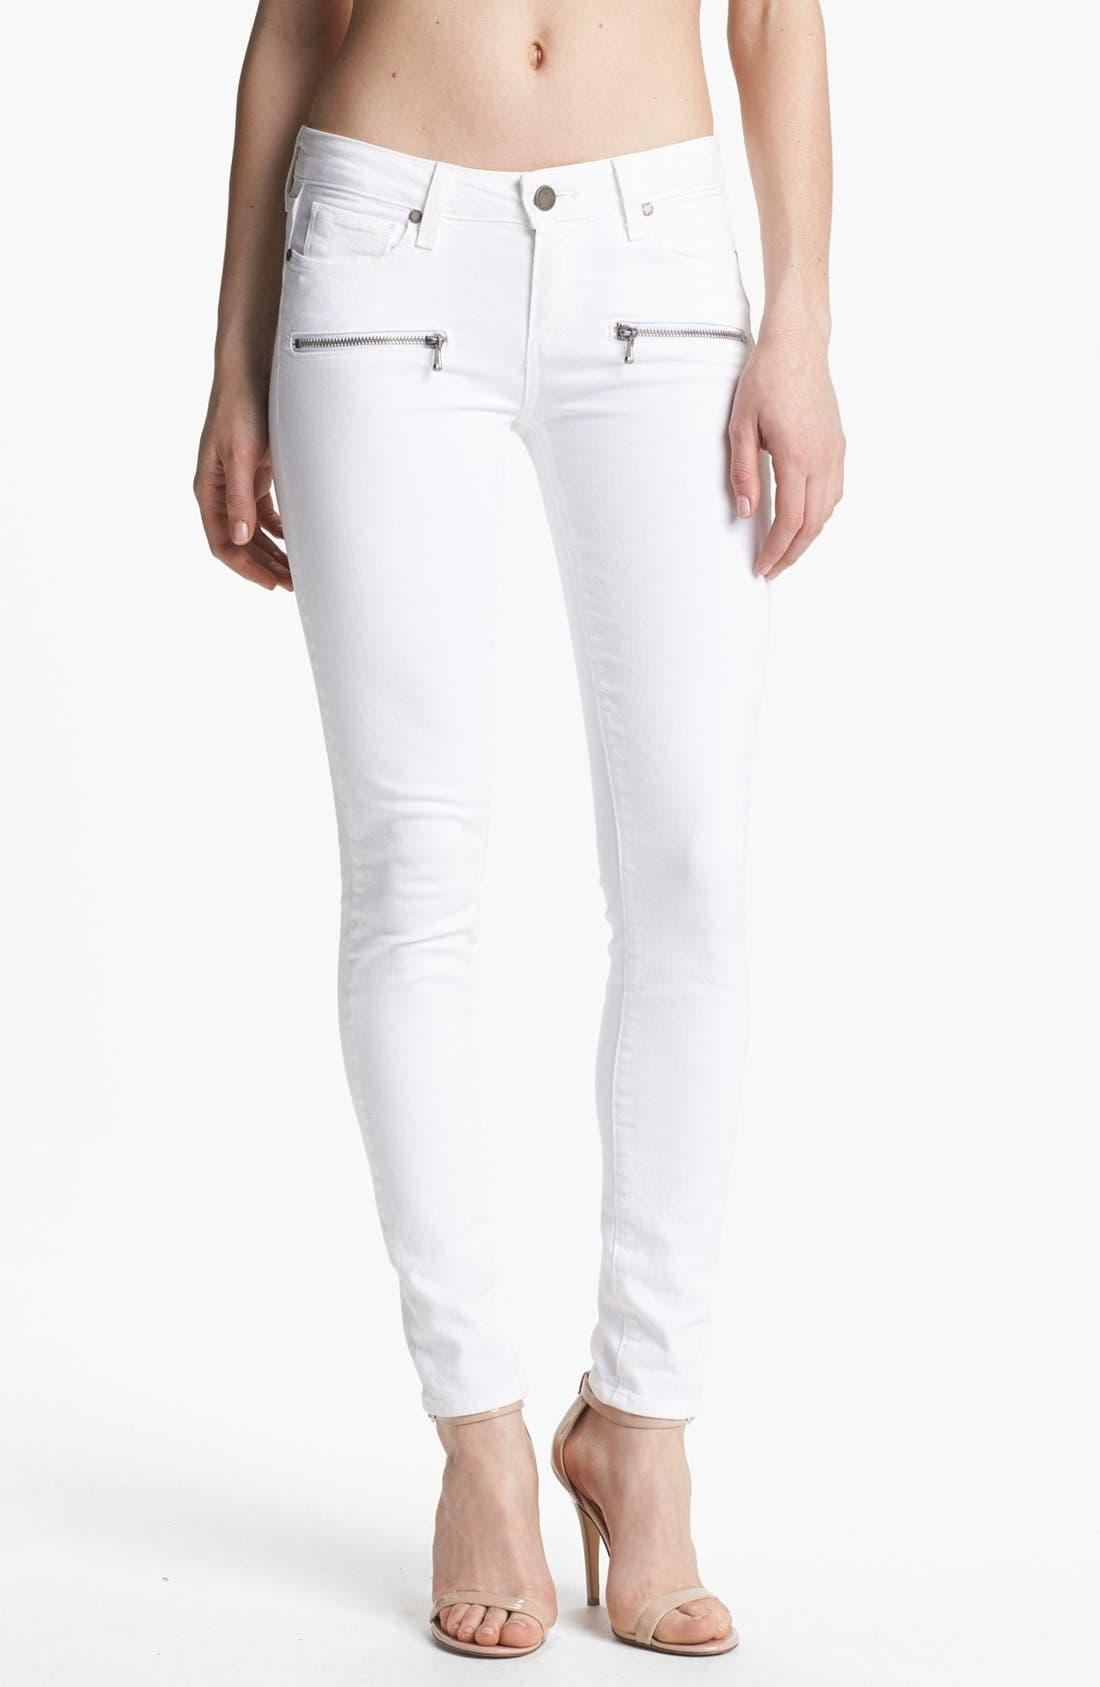 Main Image - Paige Denim 'Indio Zip' Ultra Skinny Stretch Jeans (Optic White)